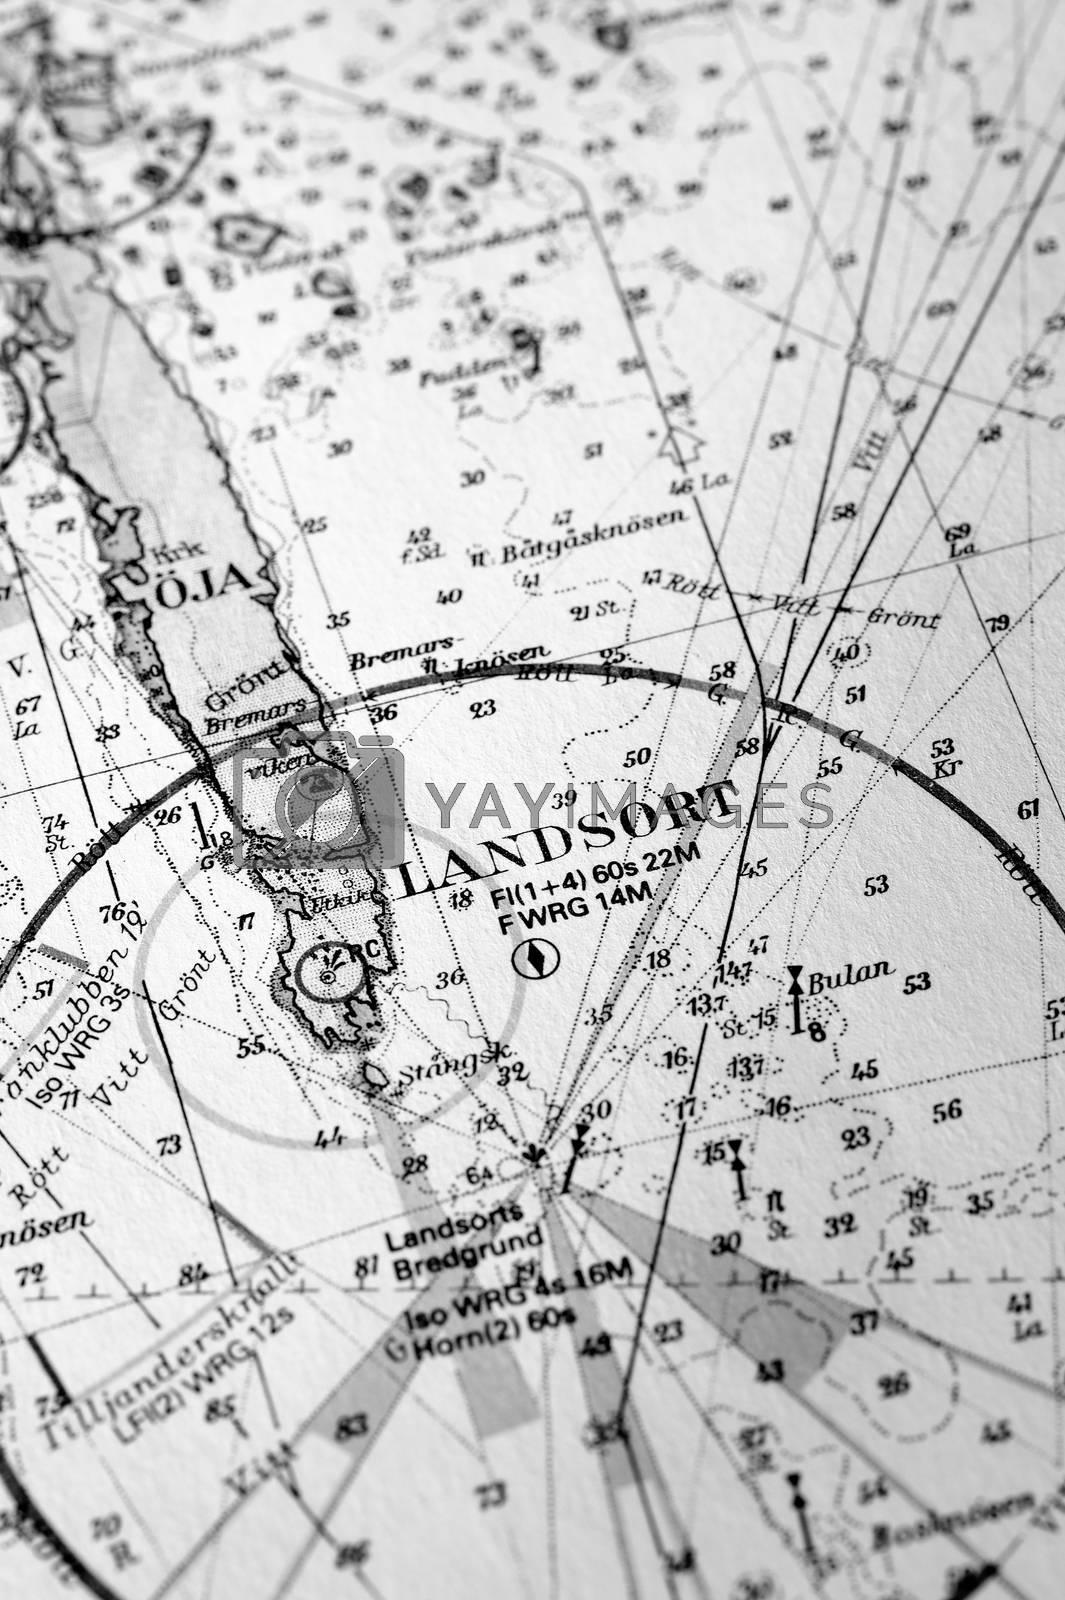 Macro shot of a old marine chart, detailing Stockholm archipelago